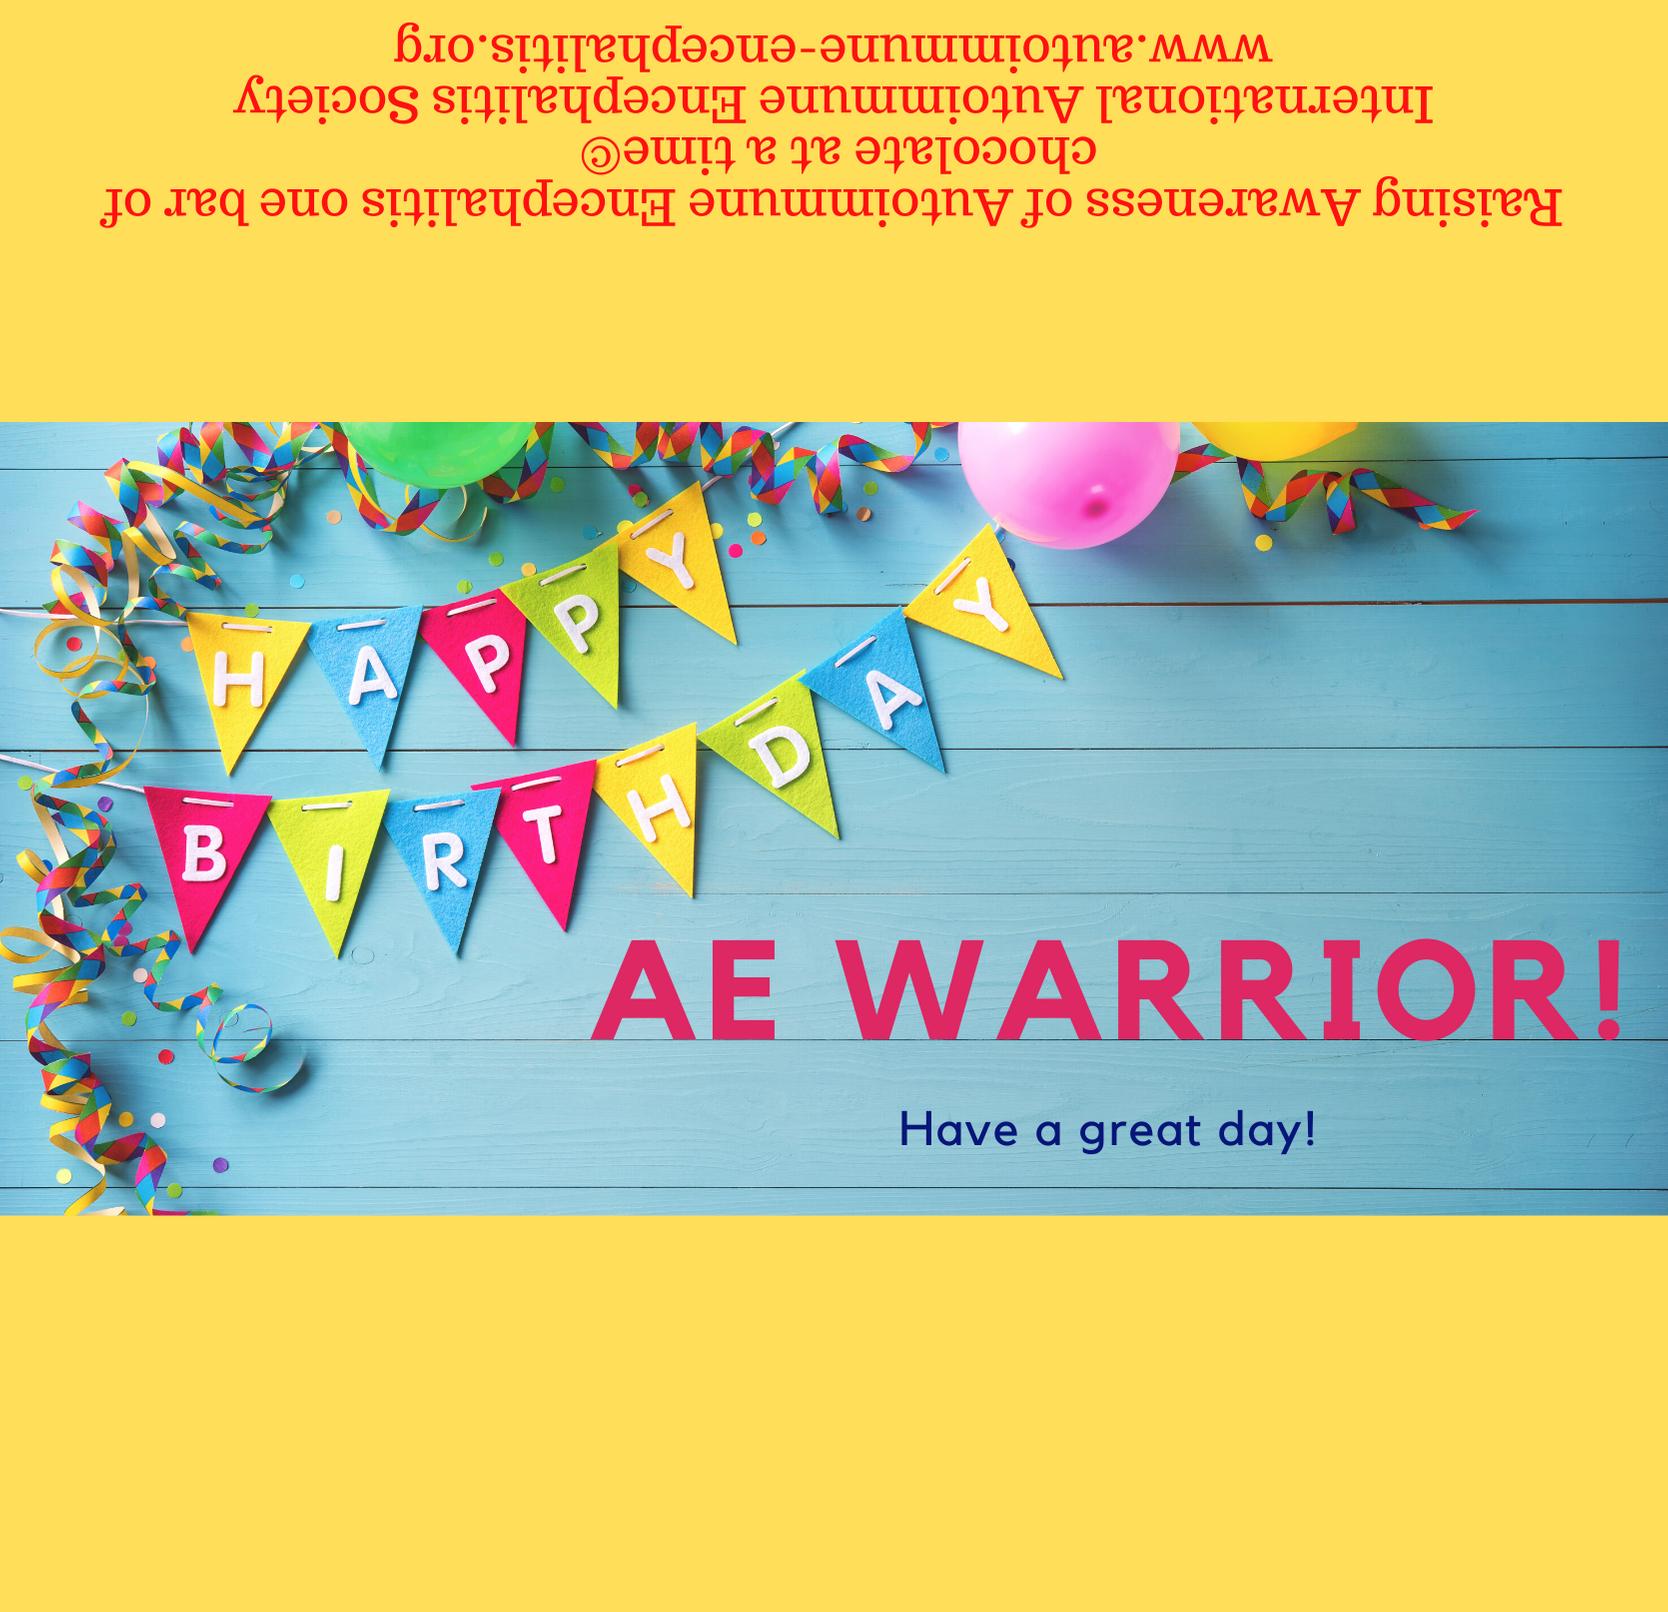 Happy Birthday Candy Wrapper 5 9 16  x 5 3 8  - Downloads